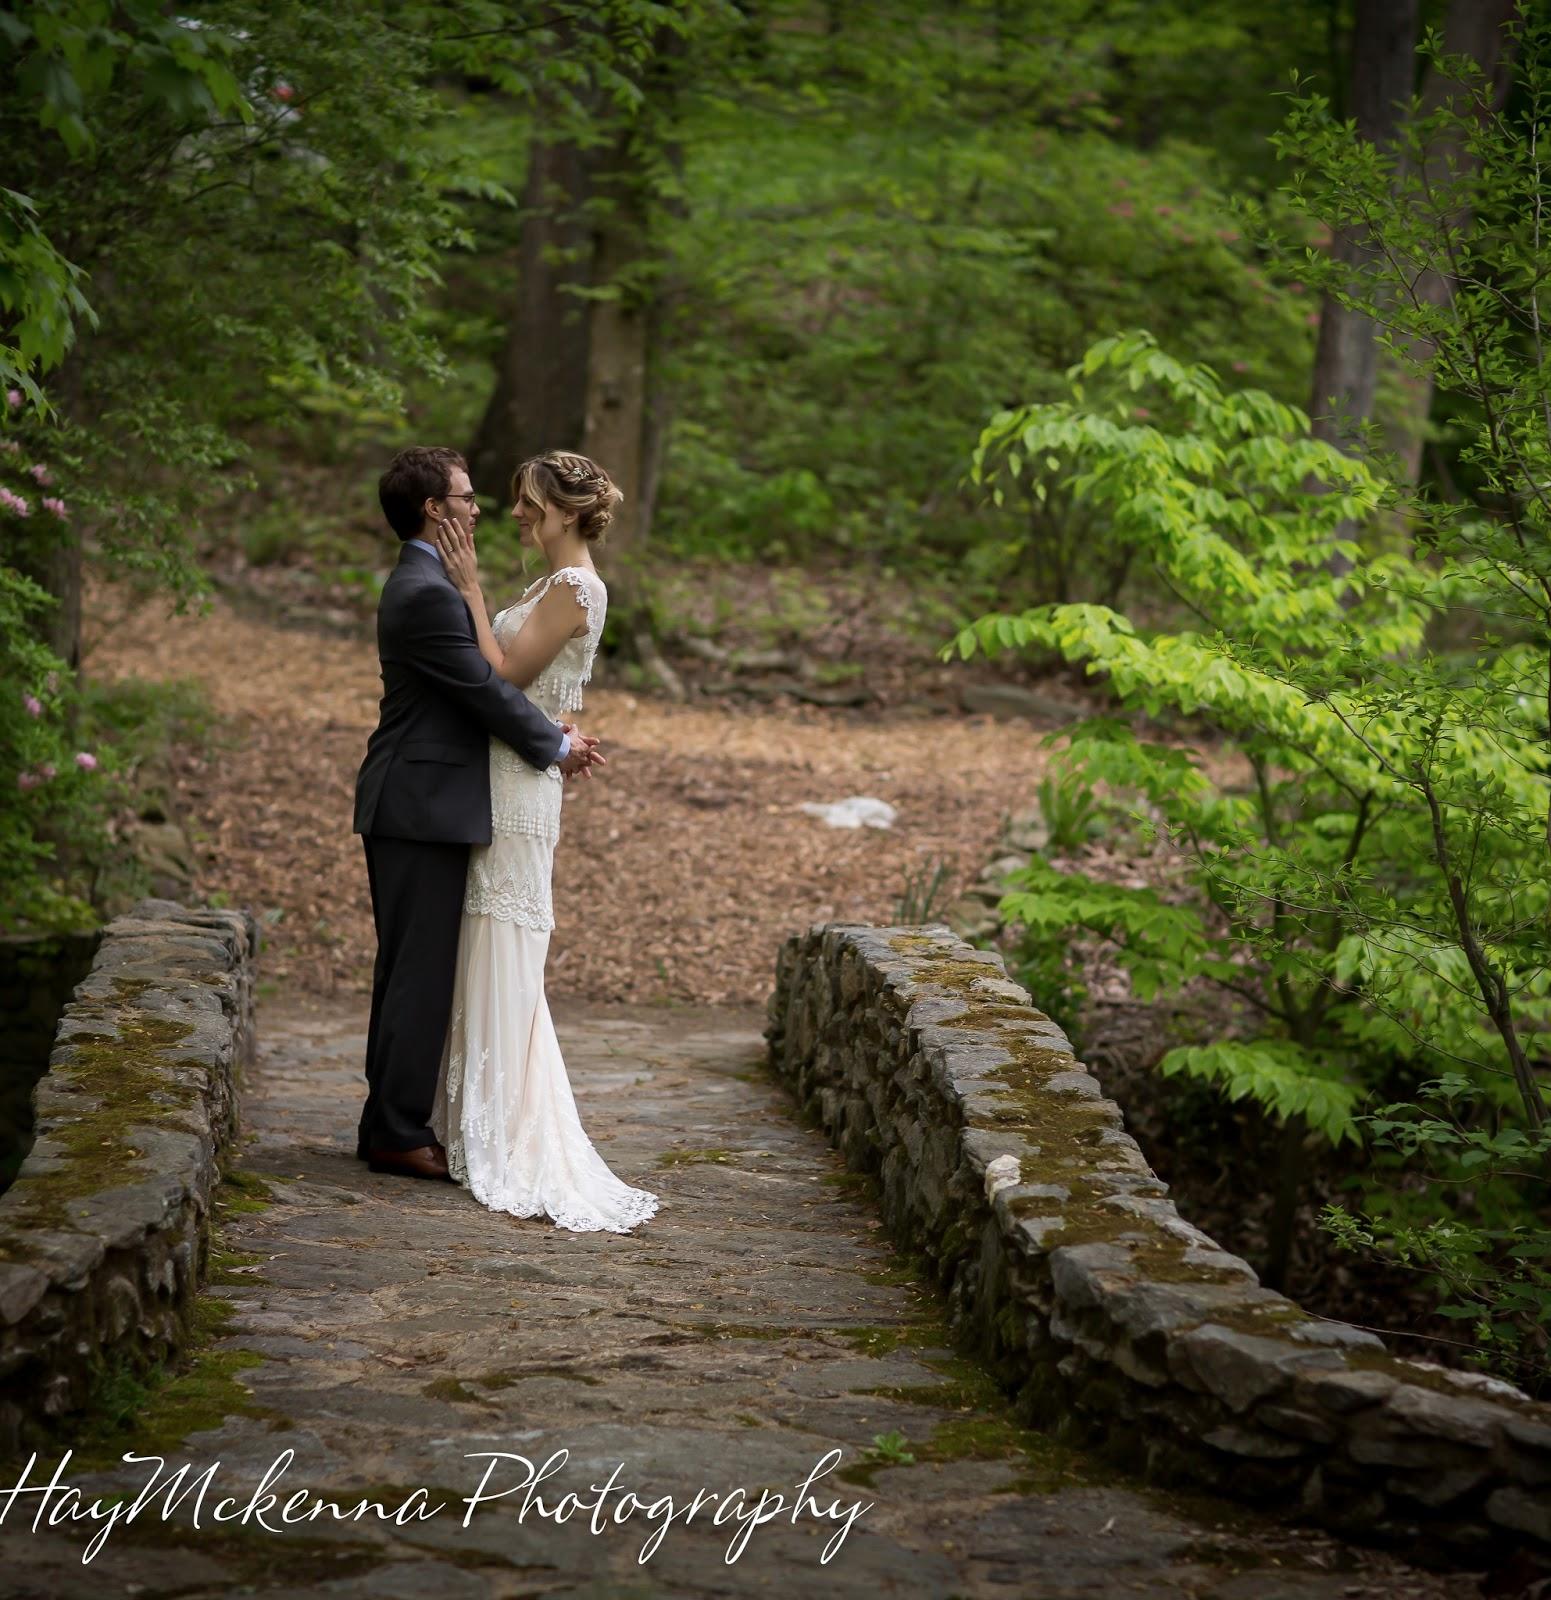 HayMckenna Photography: Outdoor Wedding in the Woods at ...